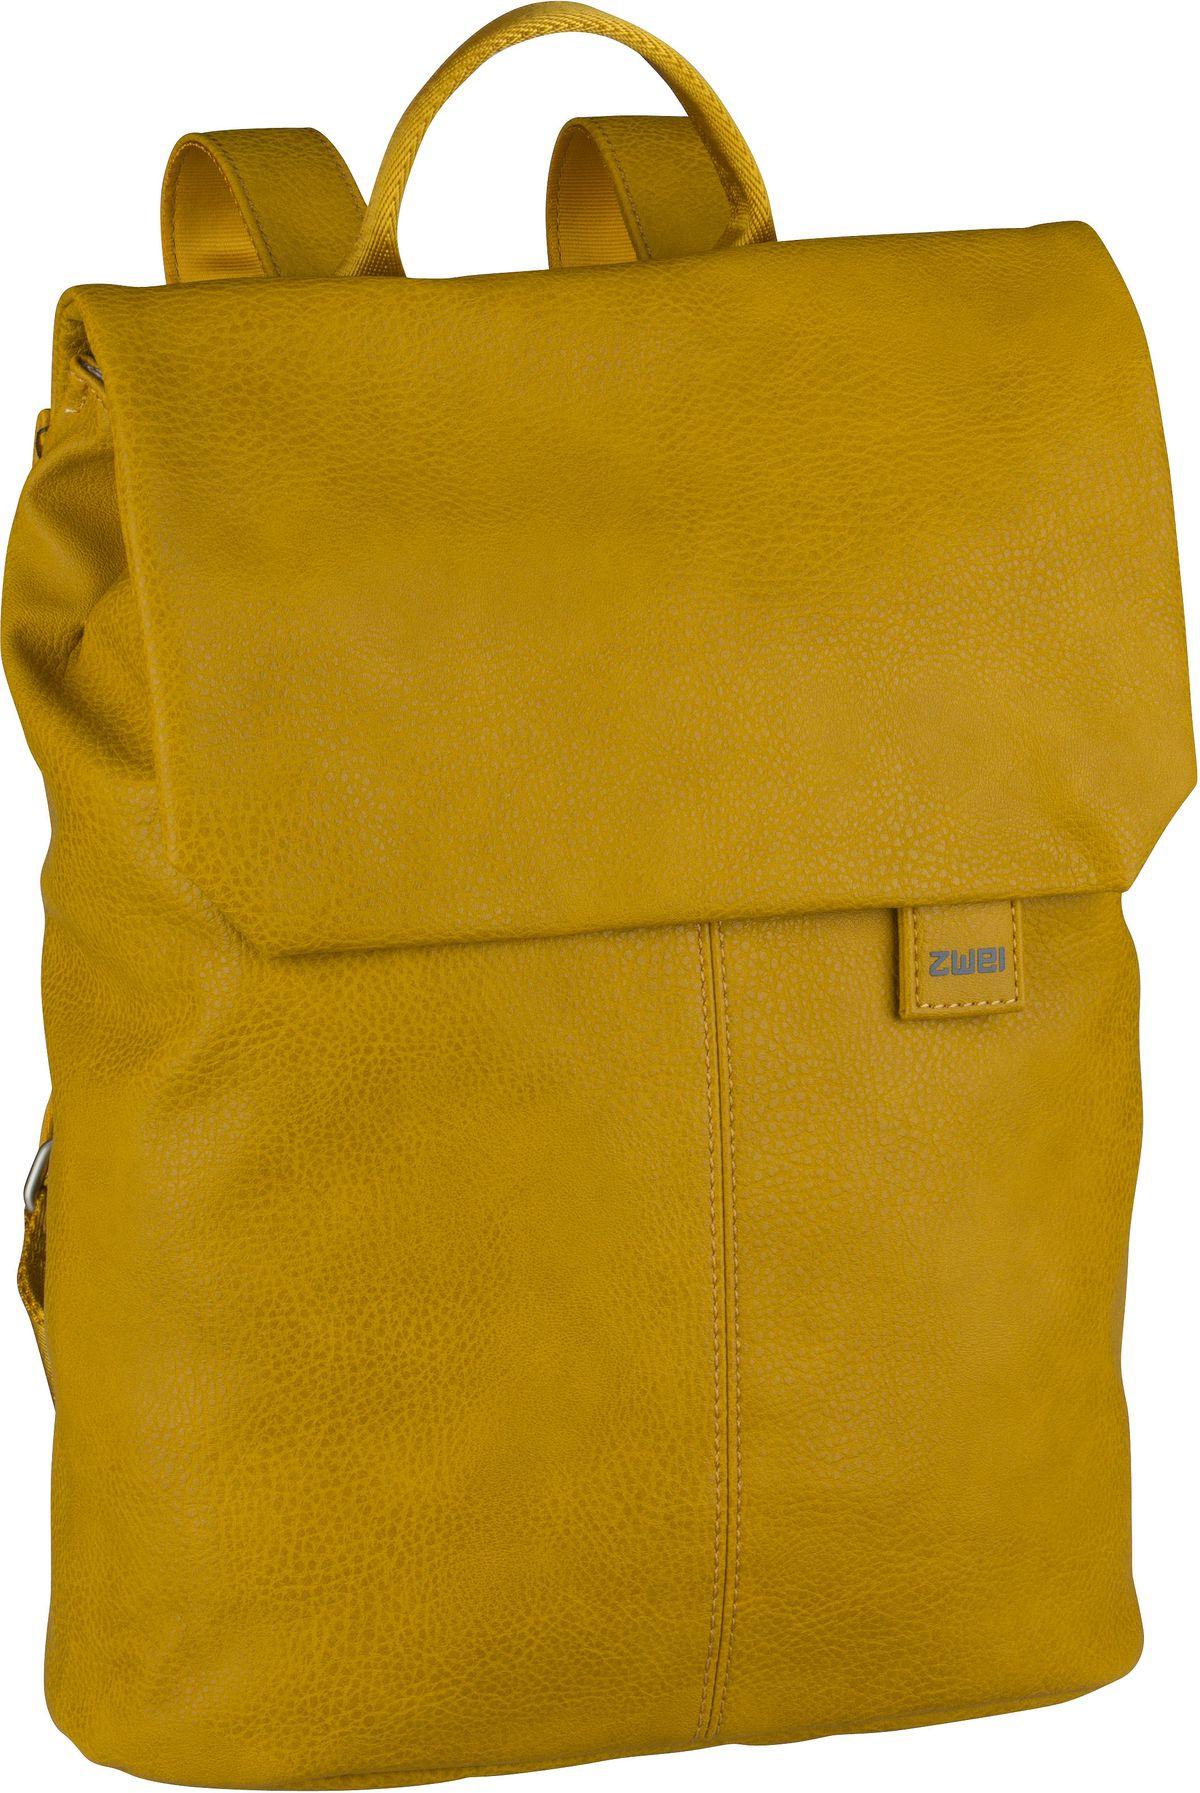 Laptoprucksack Mademoiselle MR13 Yellow (6 Liter)